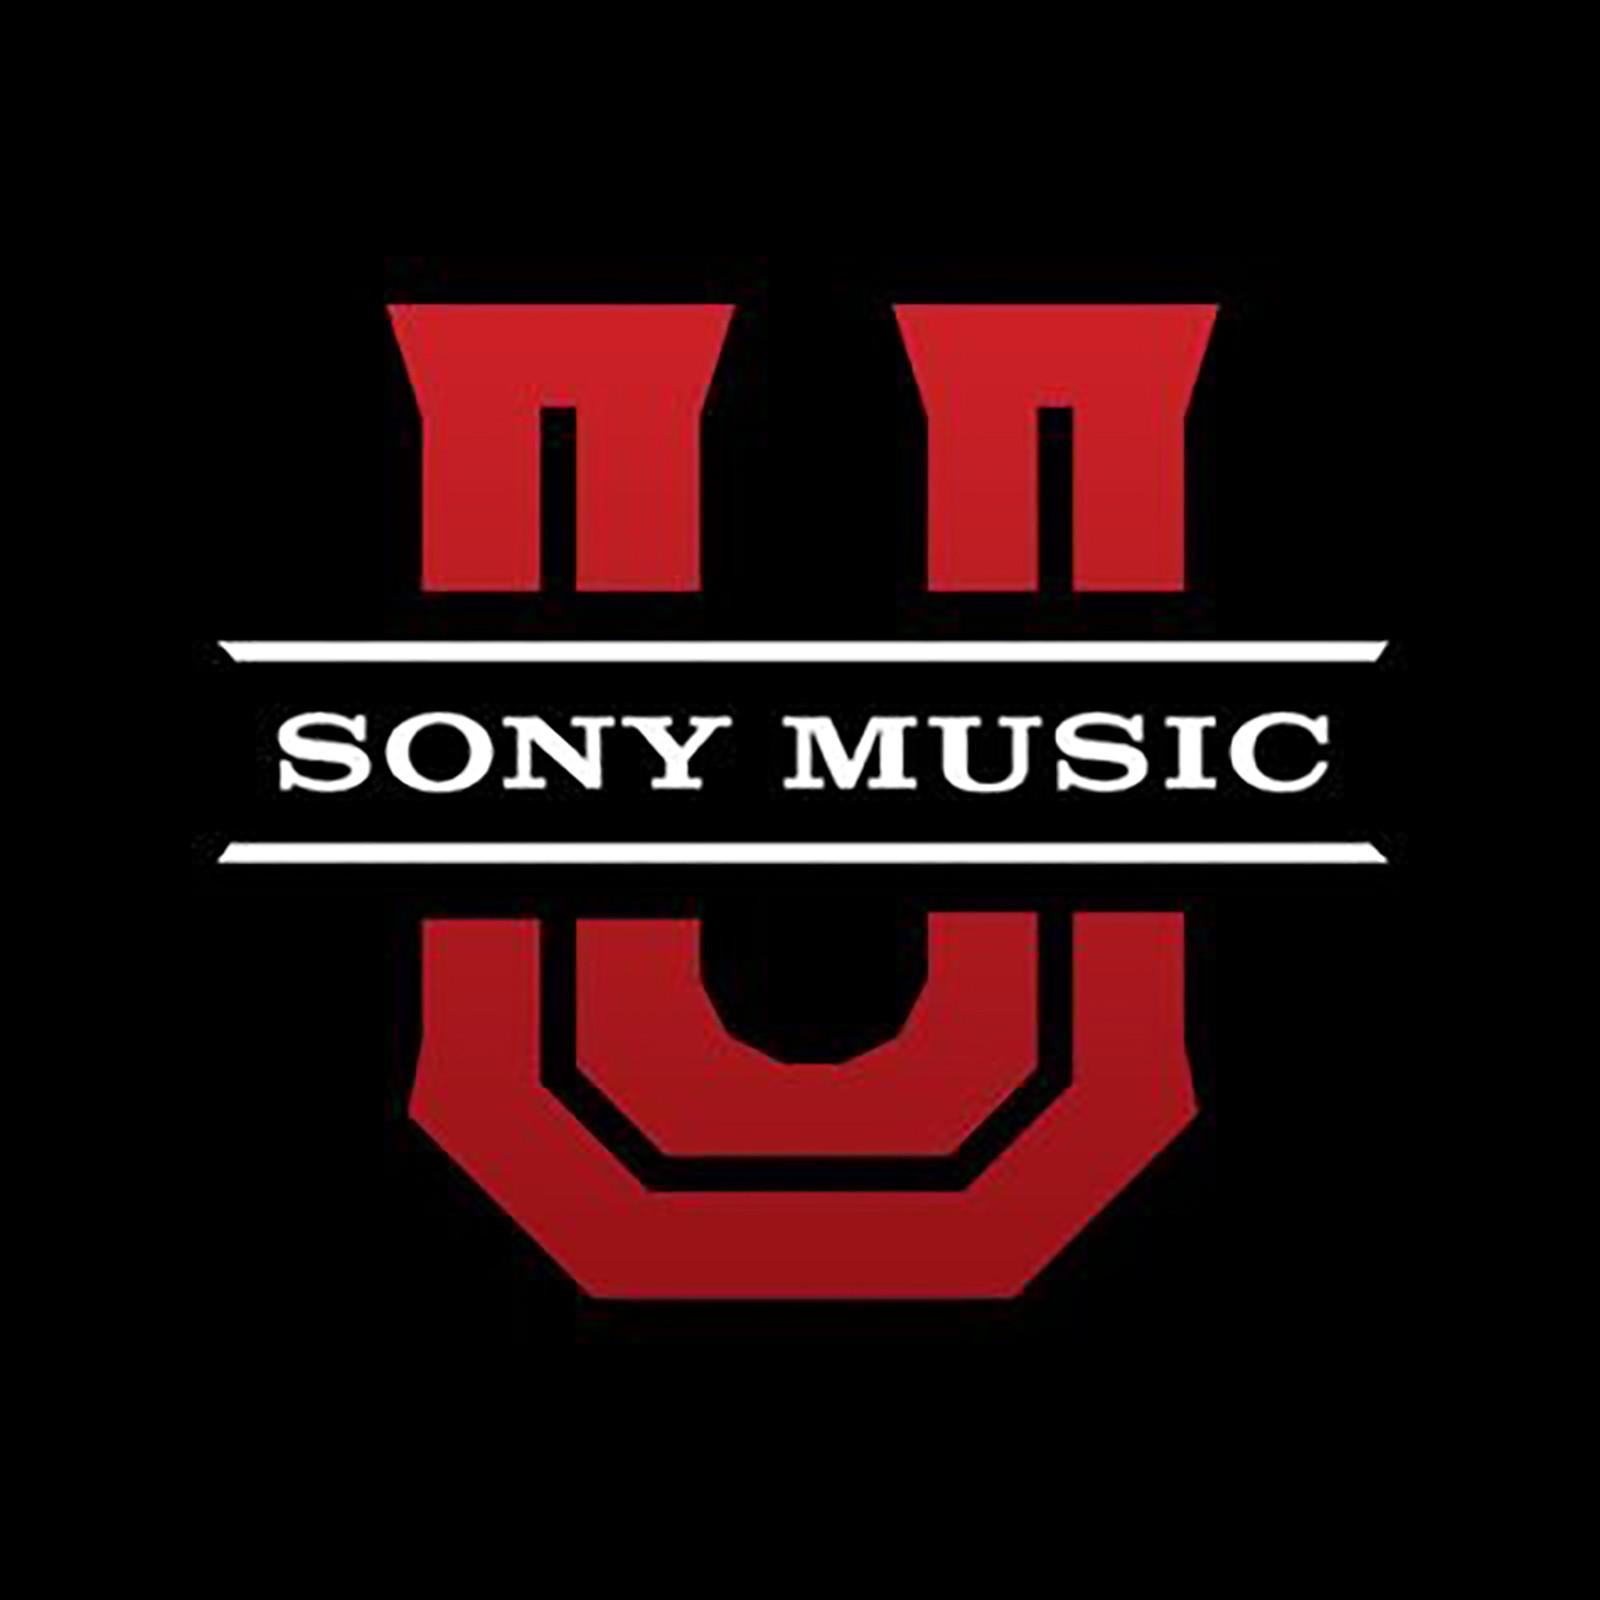 Сони Music подала всуд на«Первый канал» из-за песни Рики Мартина